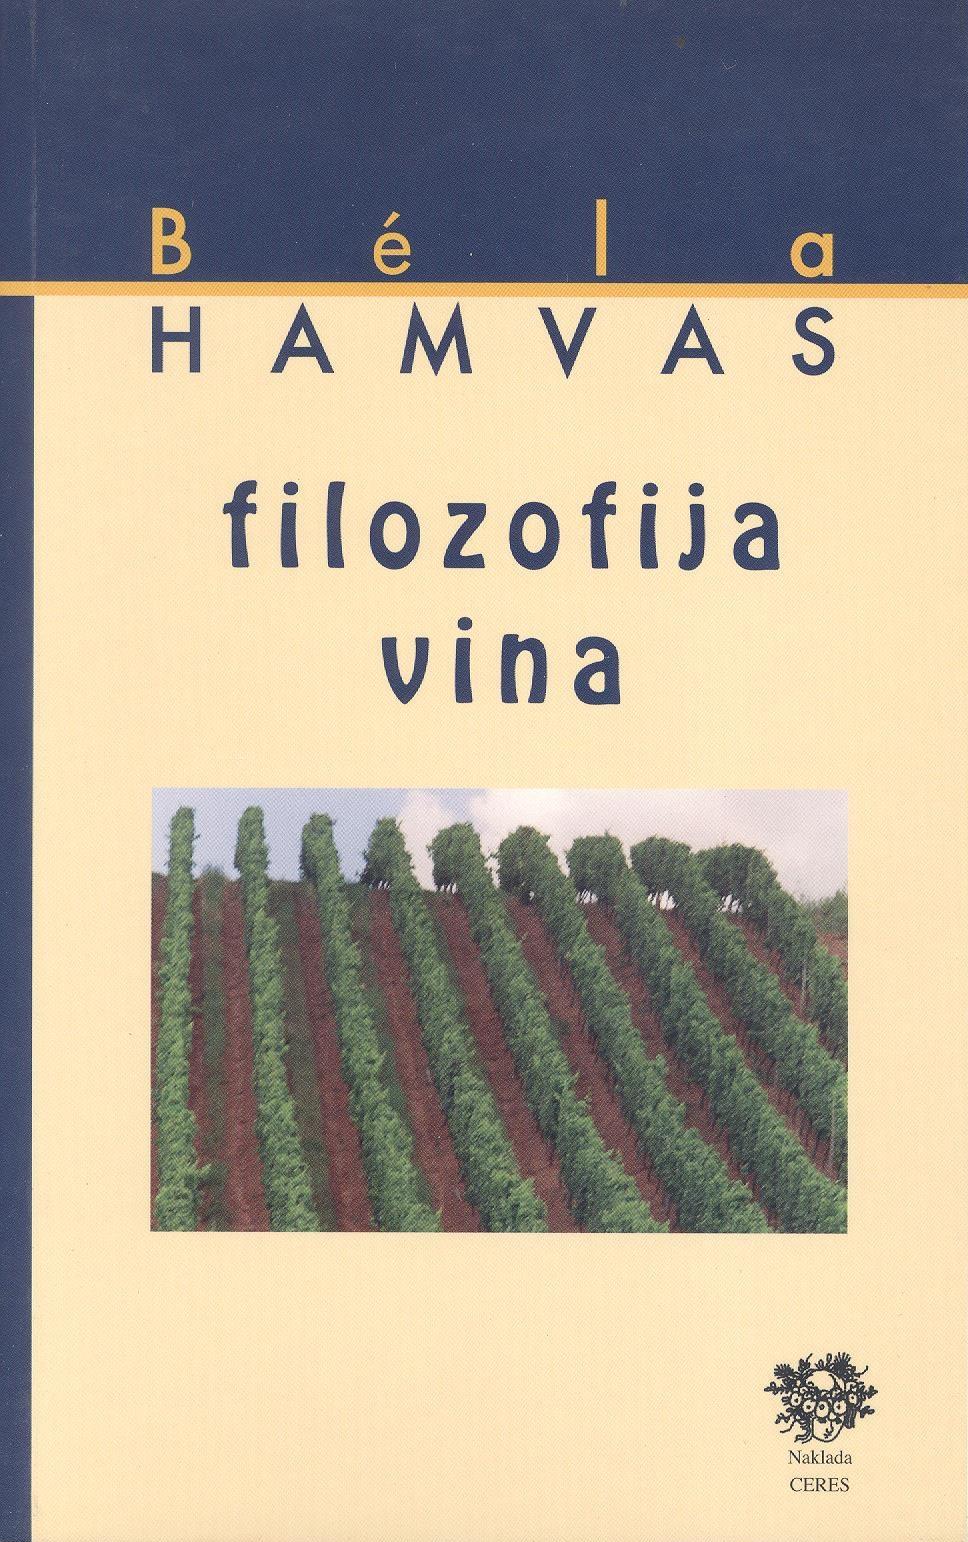 http://hrvatskifokus-2021.ga/wp-content/uploads/2017/07/ceres.hr_wp-content_uploads_2015_05_Hamvas-Filozofija-vina.jpg